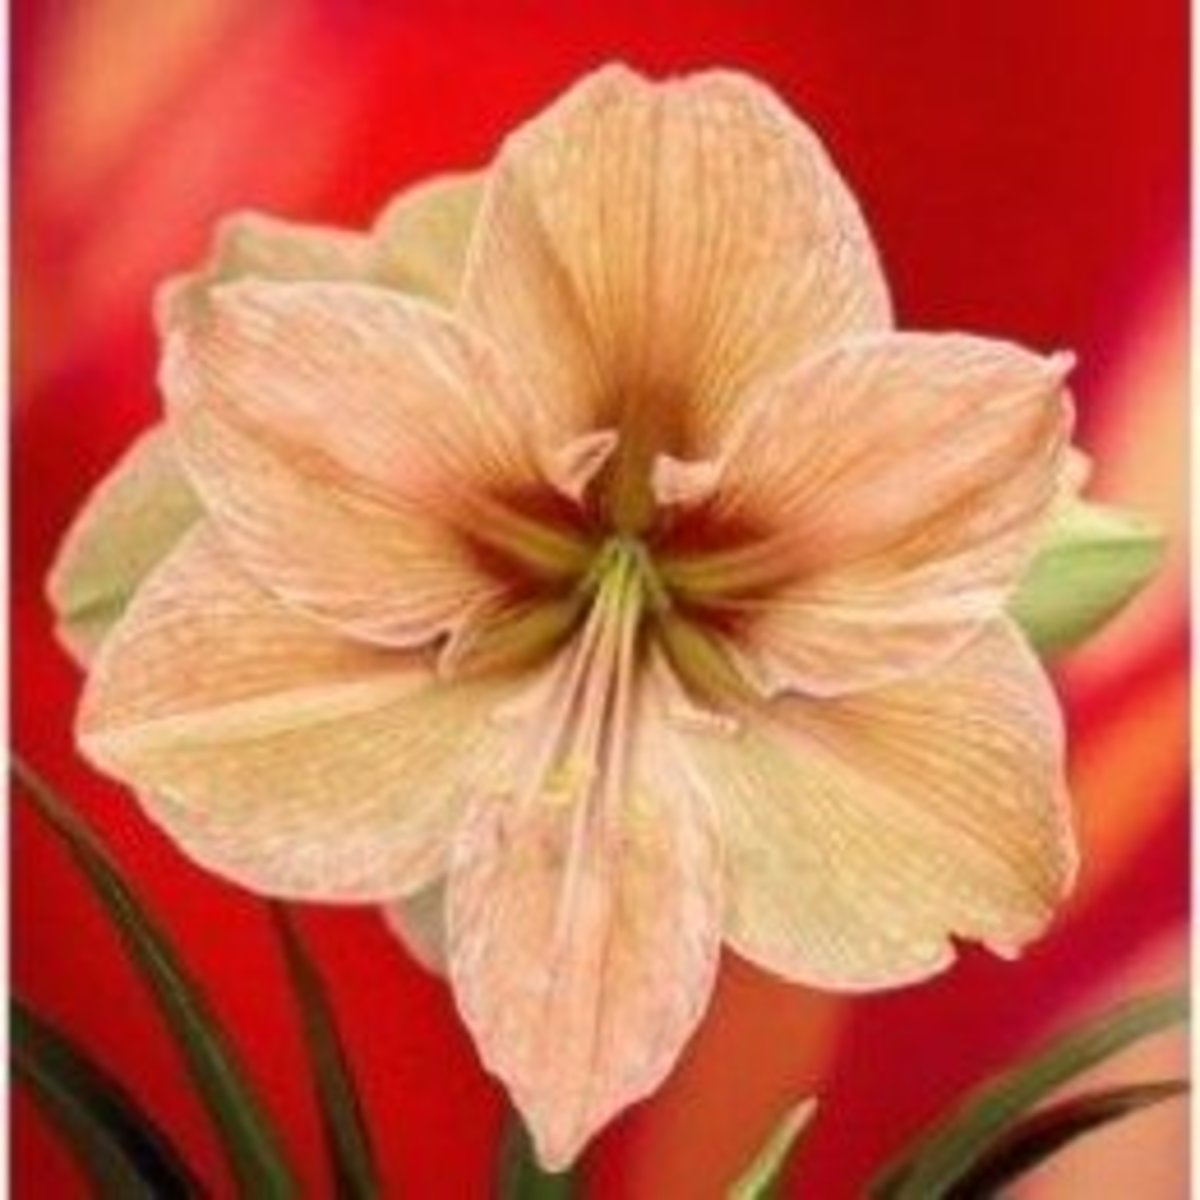 Re-grow your amaryllis.